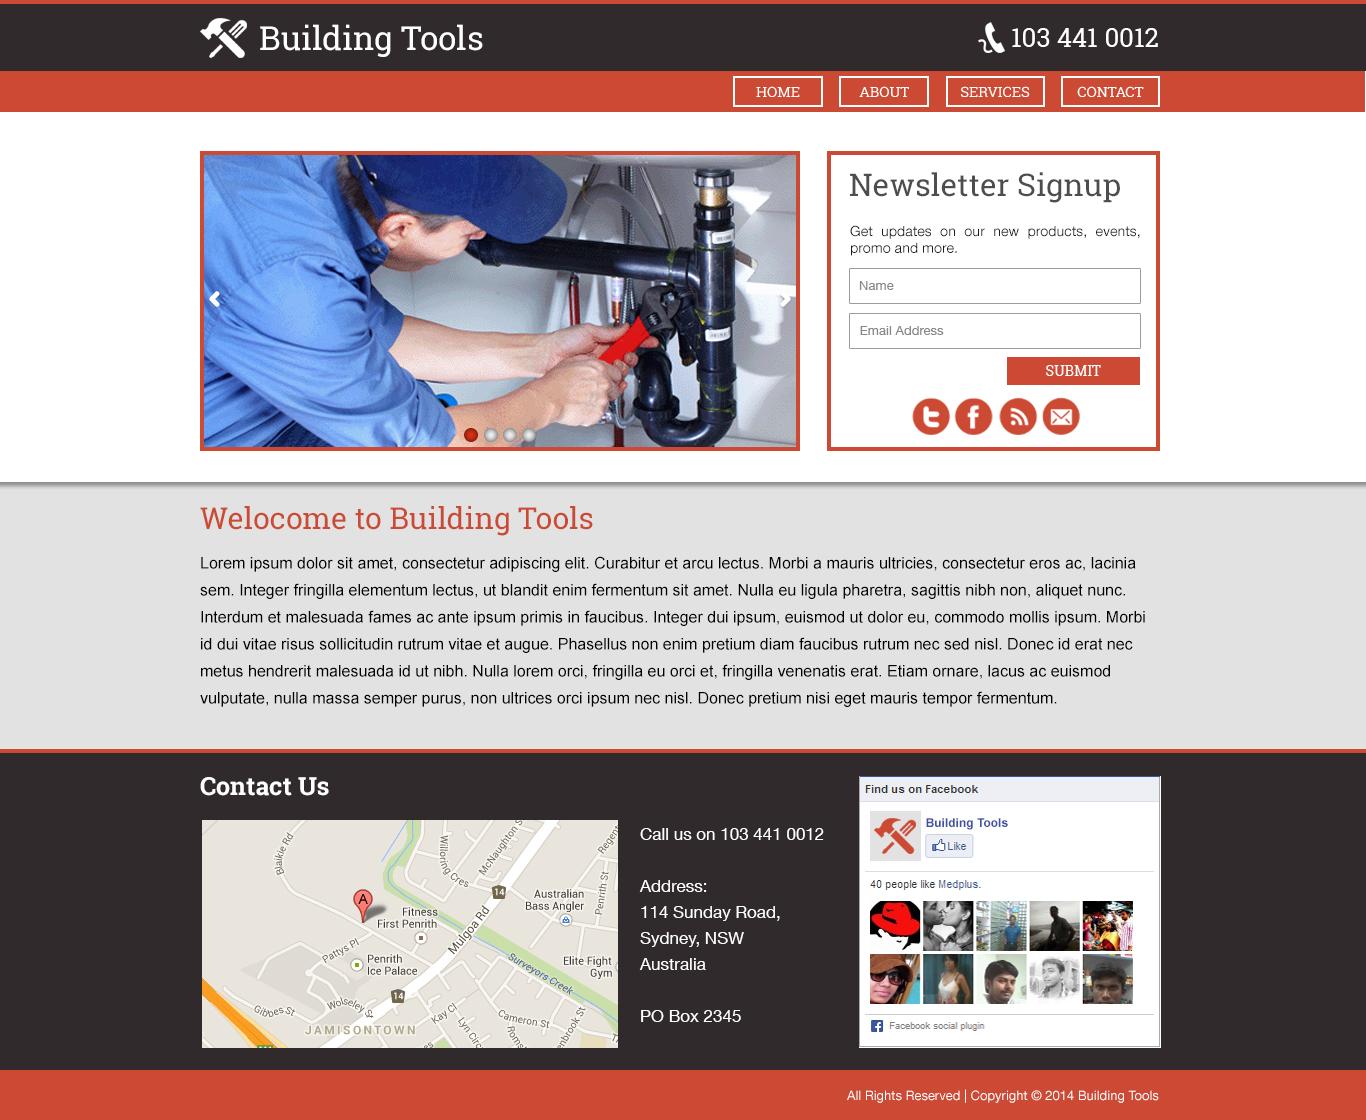 Tradesman dating website